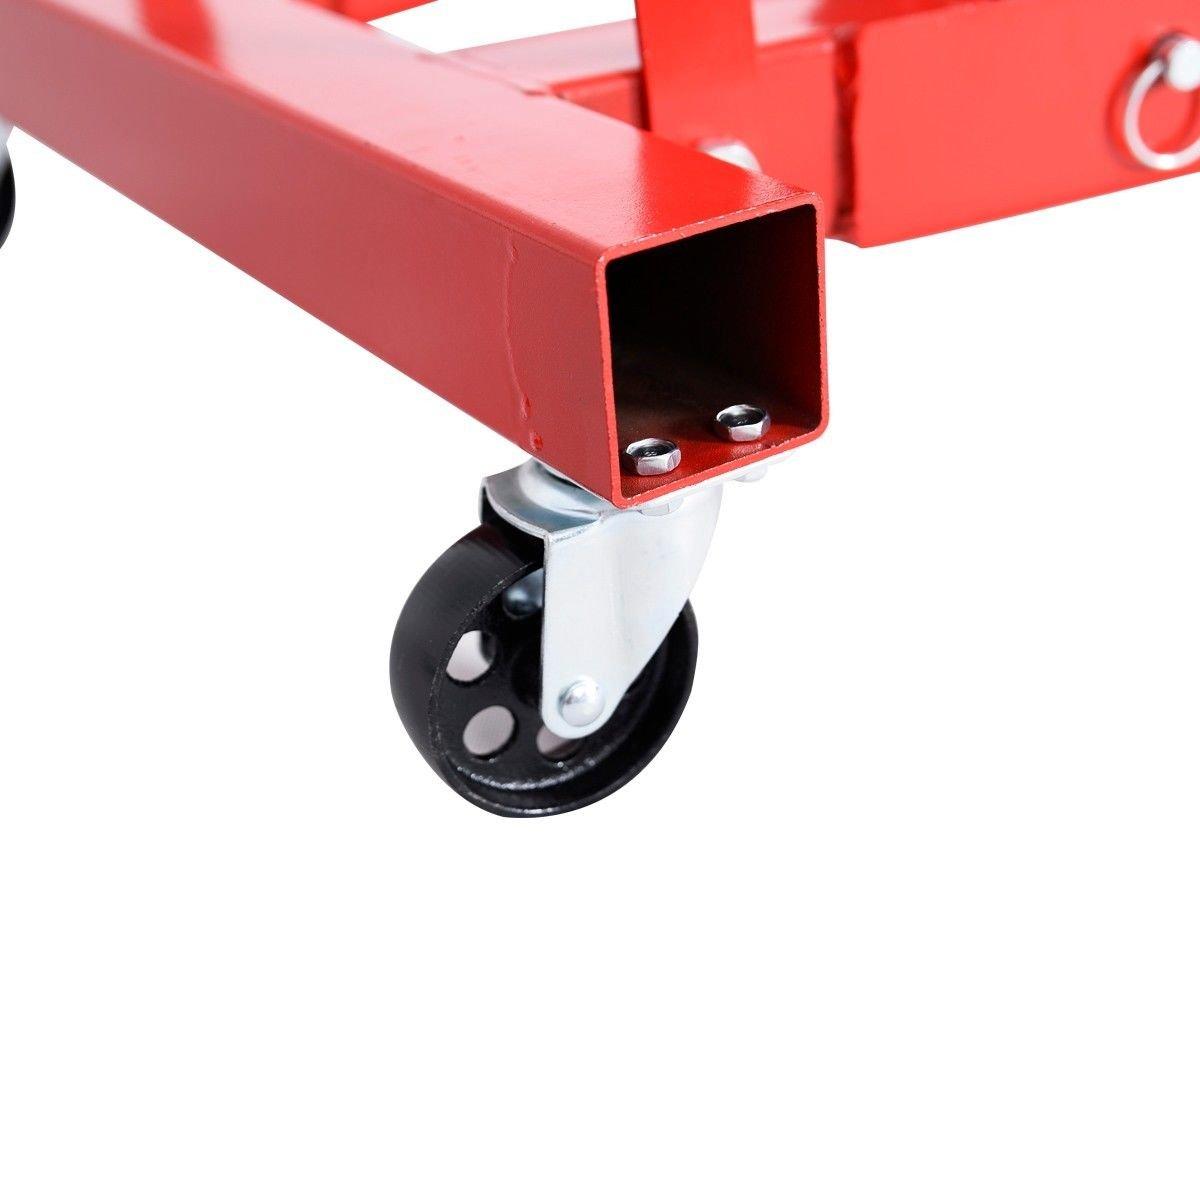 SKEMIDEX---New 2 TON Red Color 4000 lb Engine Motor Hoist Cherry Picker Shop Crane Lift And espresso machine portafilter And espresso machine part names And espresso machine filter basket by SKEMIDEX (Image #8)